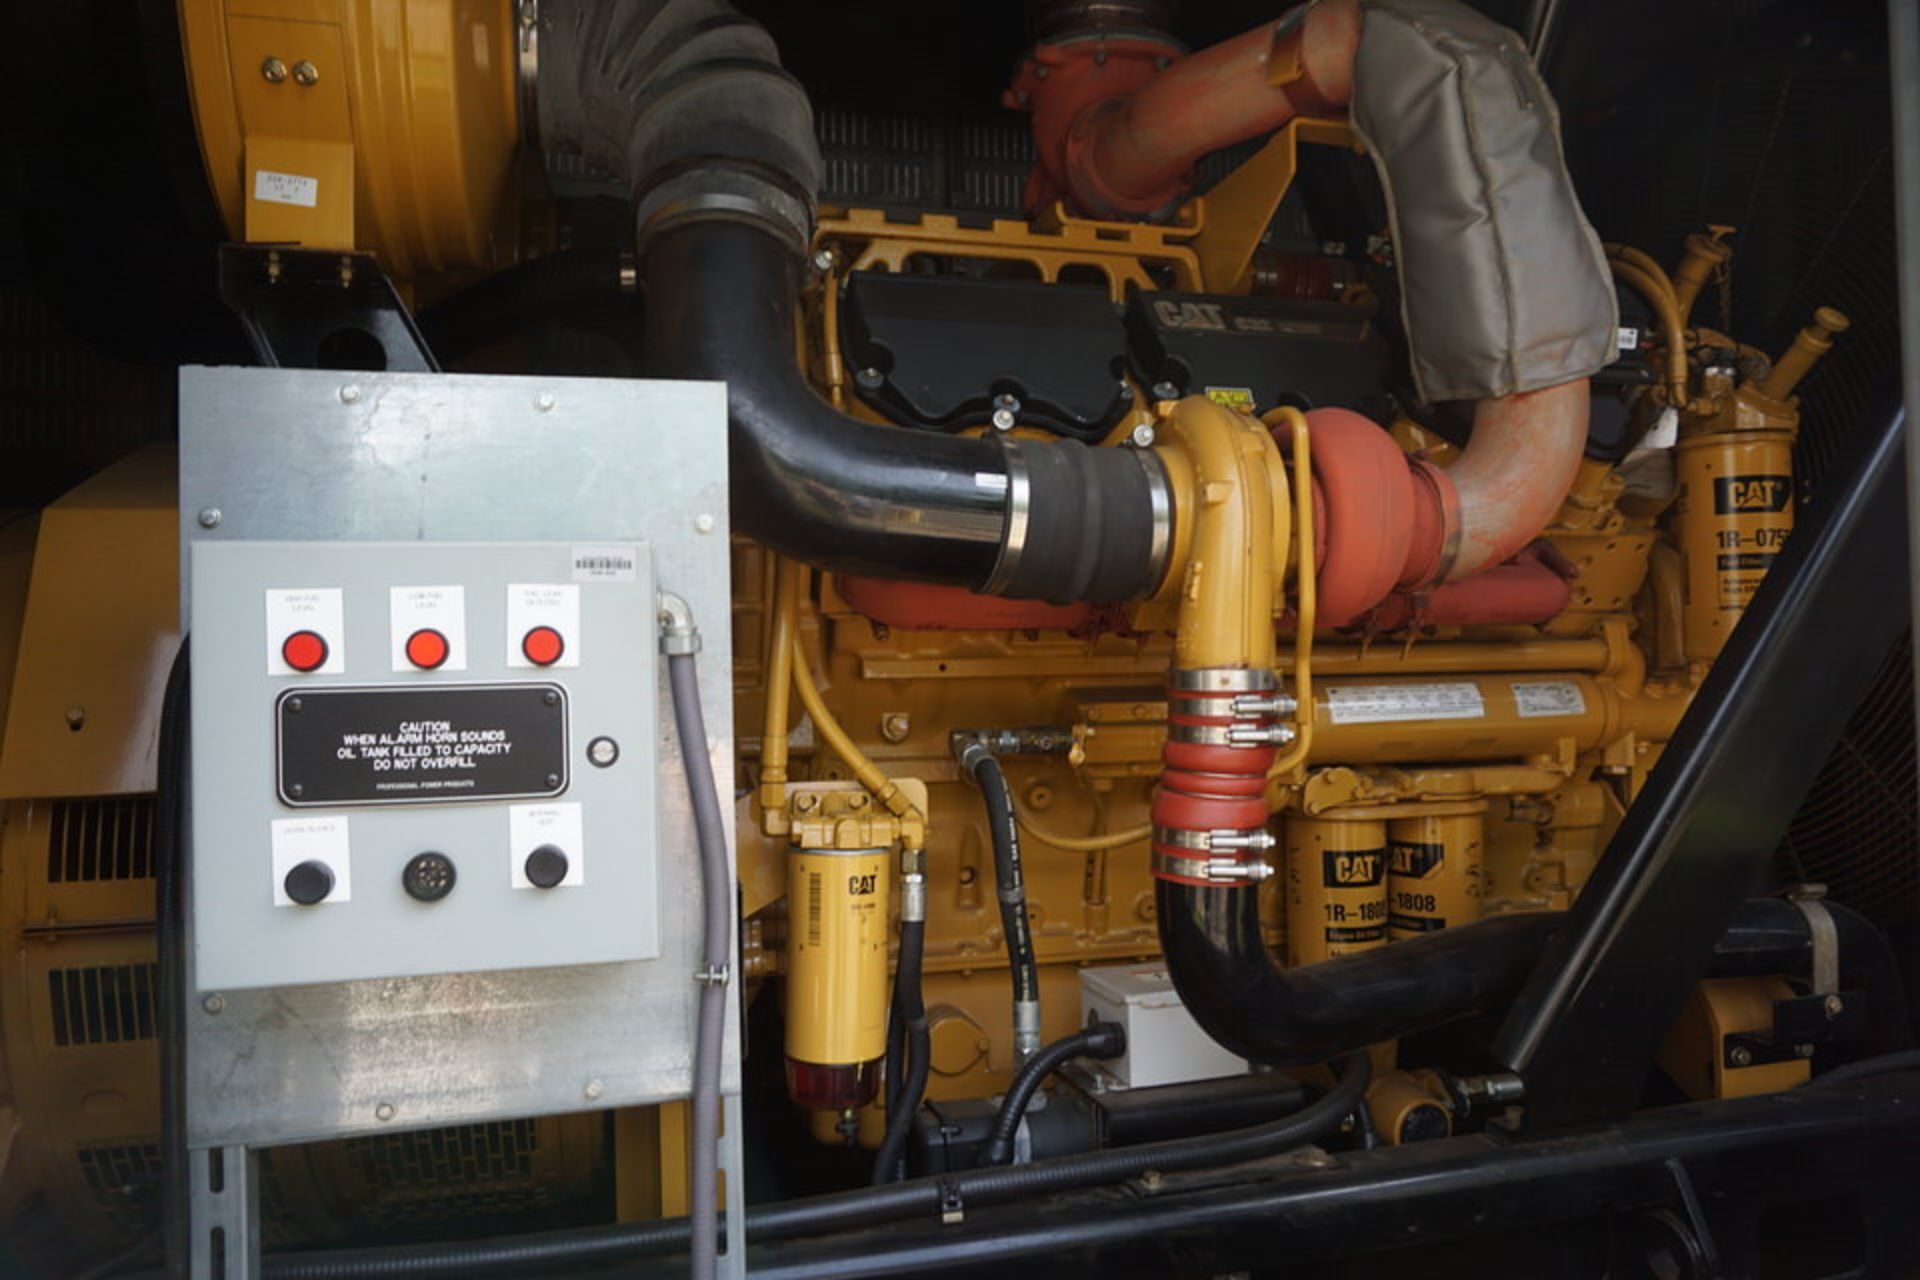 2007 CATERPILLAR BACK UP GENERATOR, ENGINE MODEL: C32 W/ EMCP3.3 CONTROL, 173.9 HOURS, 1250 KVA - Image 19 of 25